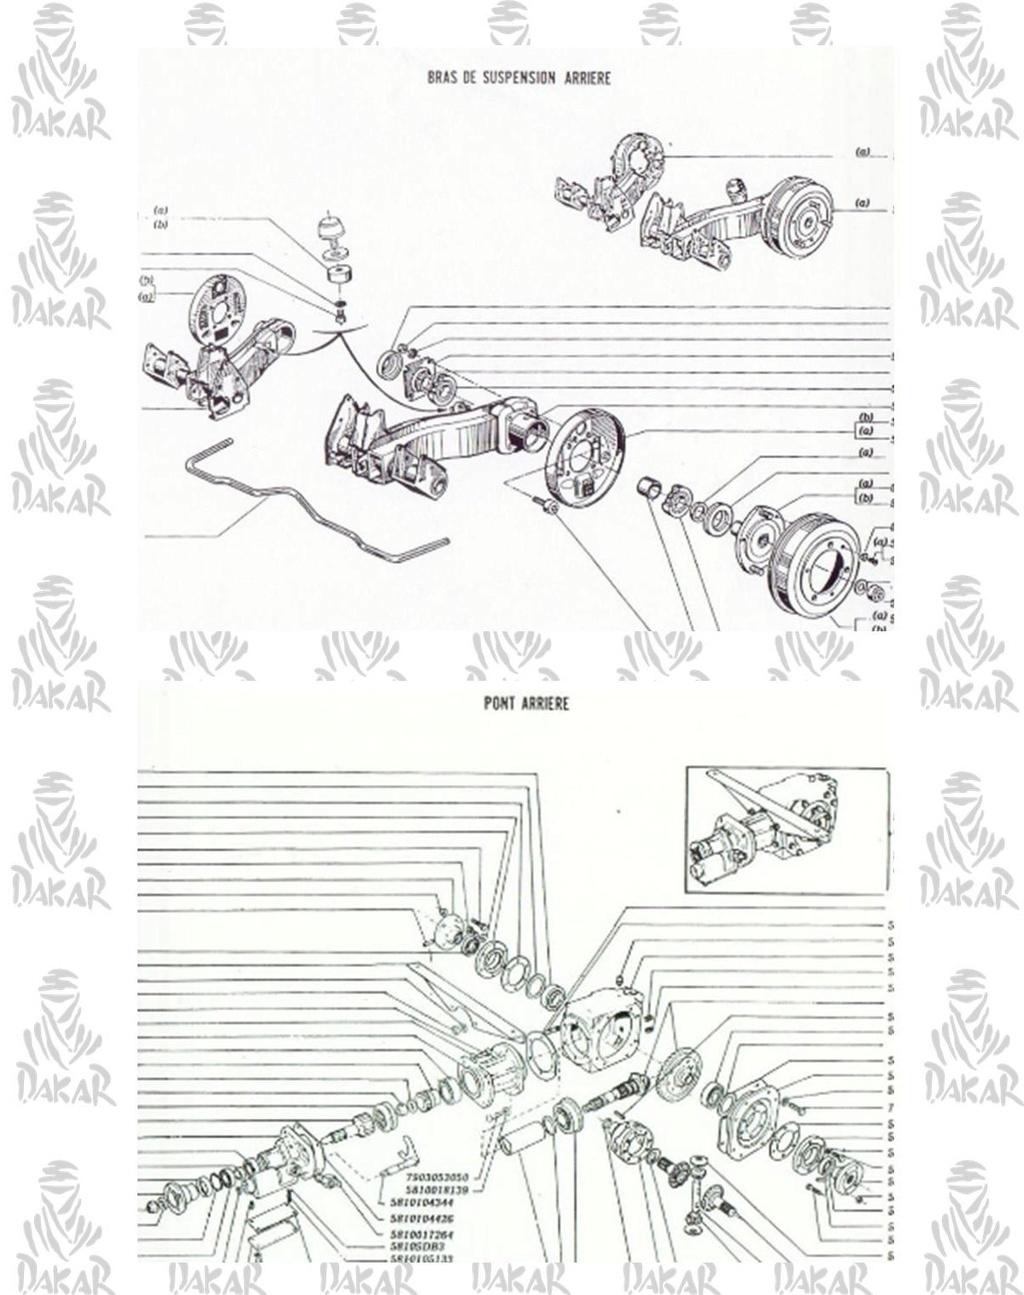 [1/24]Renault 4 l dakar 1980 Ref 80759 1711